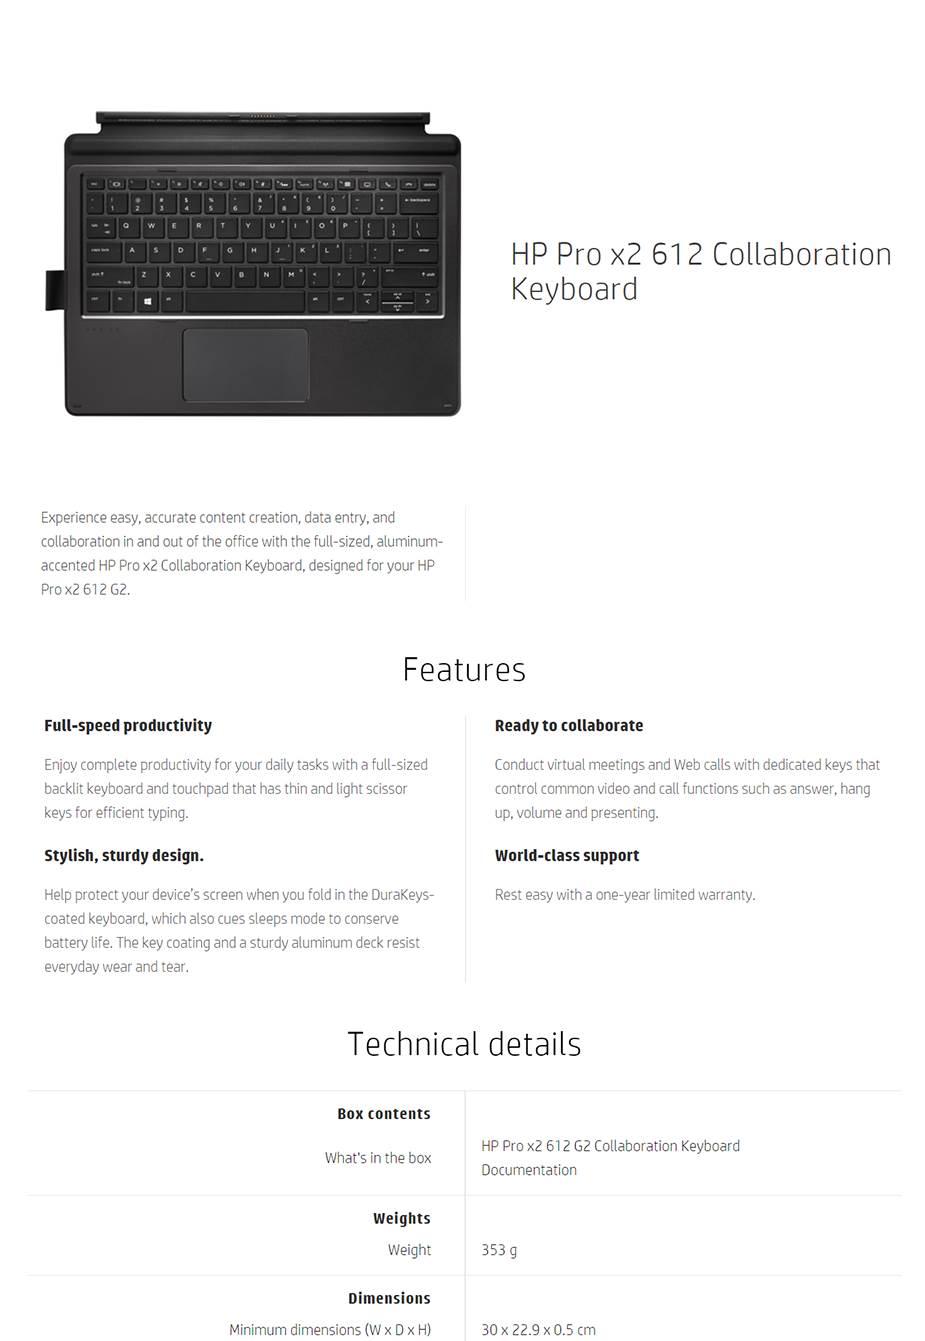 32499c861f4 Manufacturer Warranty: 12 Months Limited Warranty; Manufacturer Contact  Info: http://www.hp.com, 13 10 47